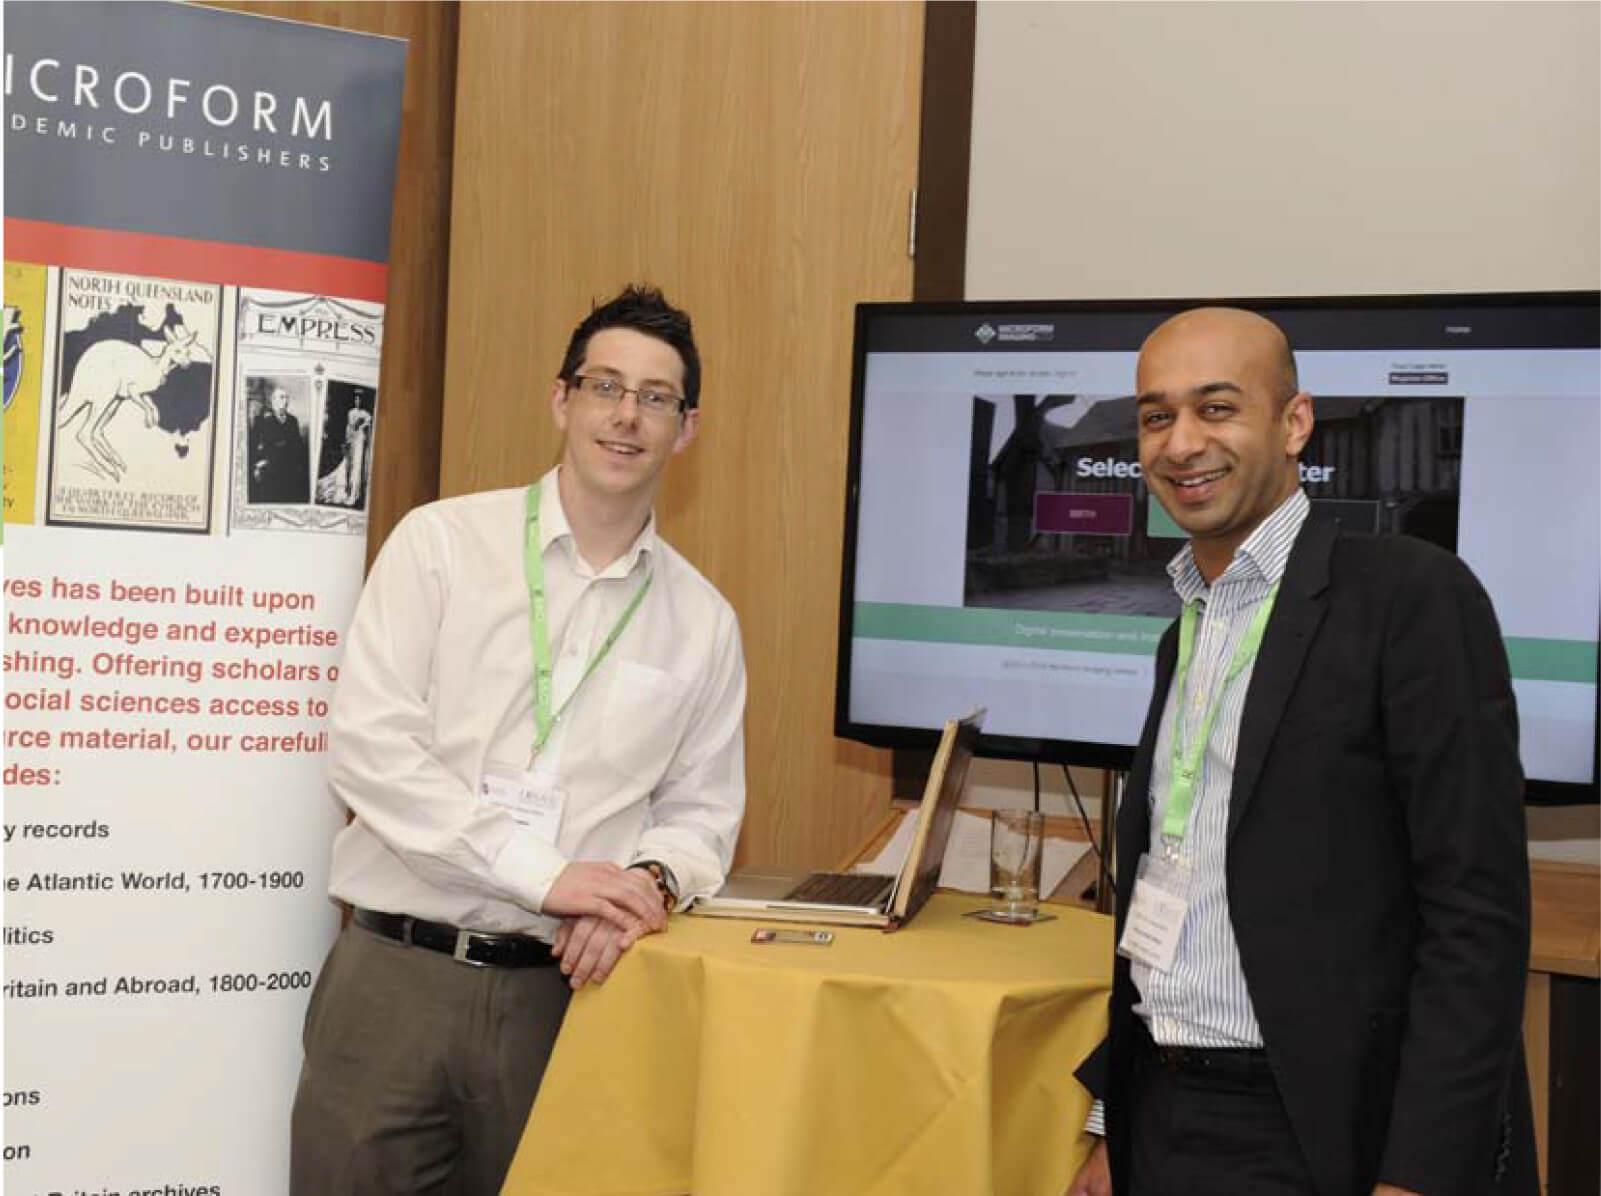 Microform Imaging Ltd at the LRSA Conference